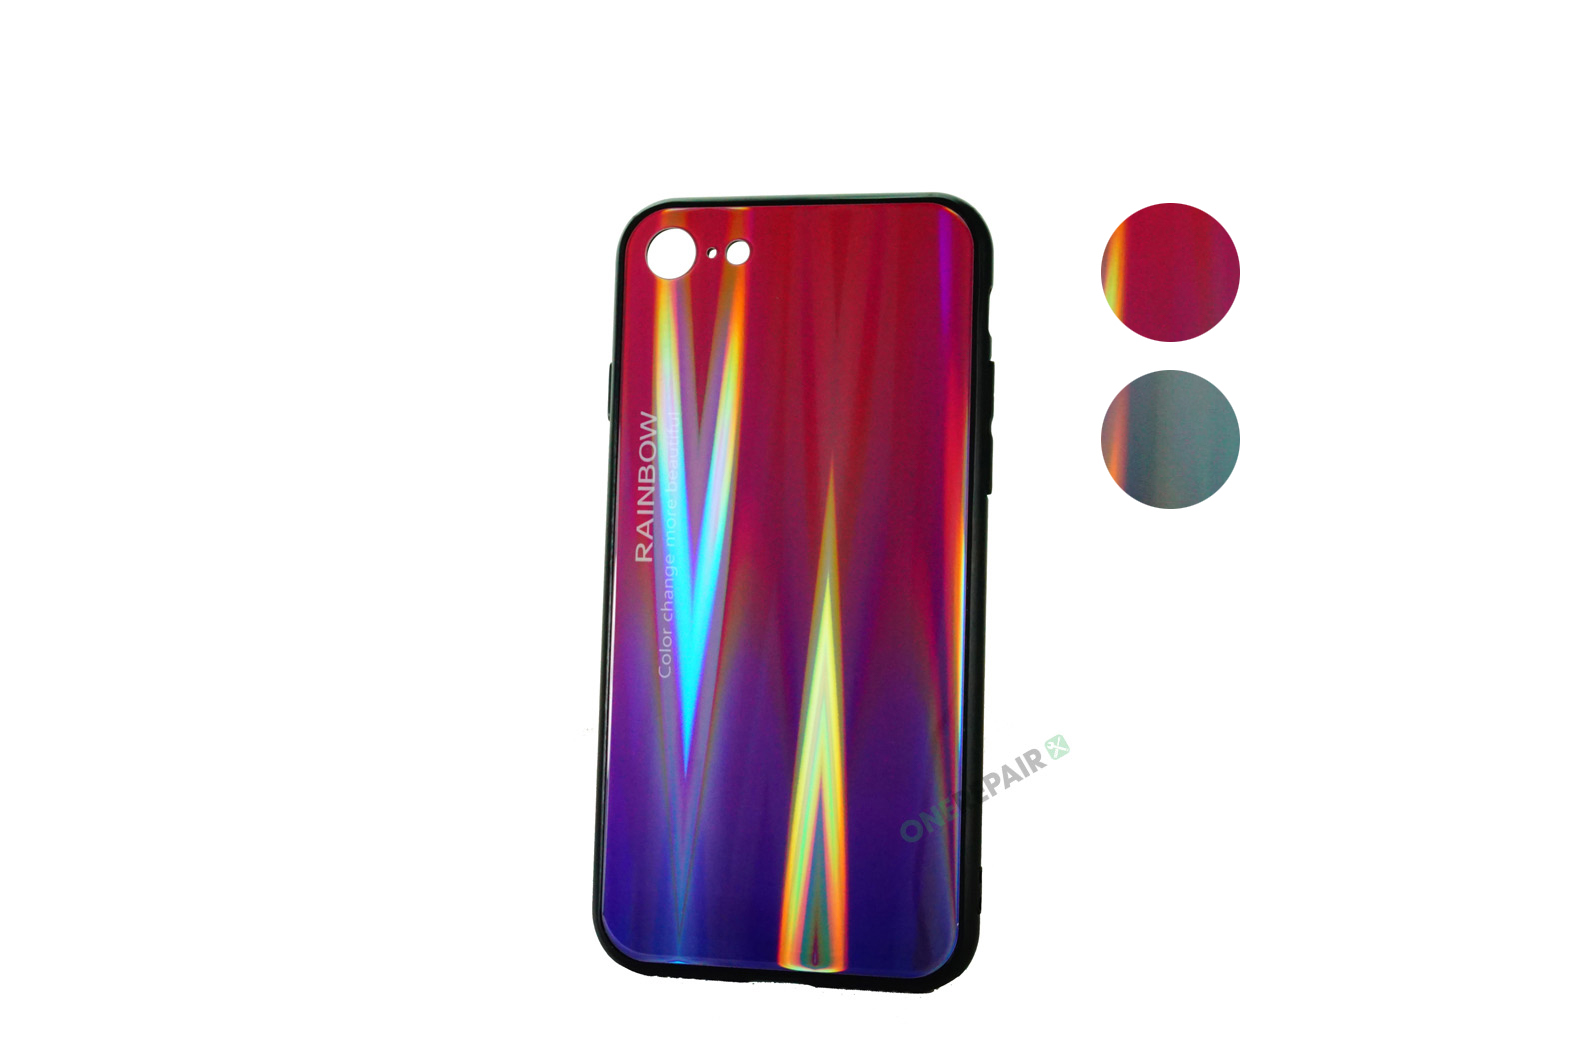 353615-001-002_iPhone_7_8_cover_rainbow_Lilla_Graa_OneRepair_Varianter